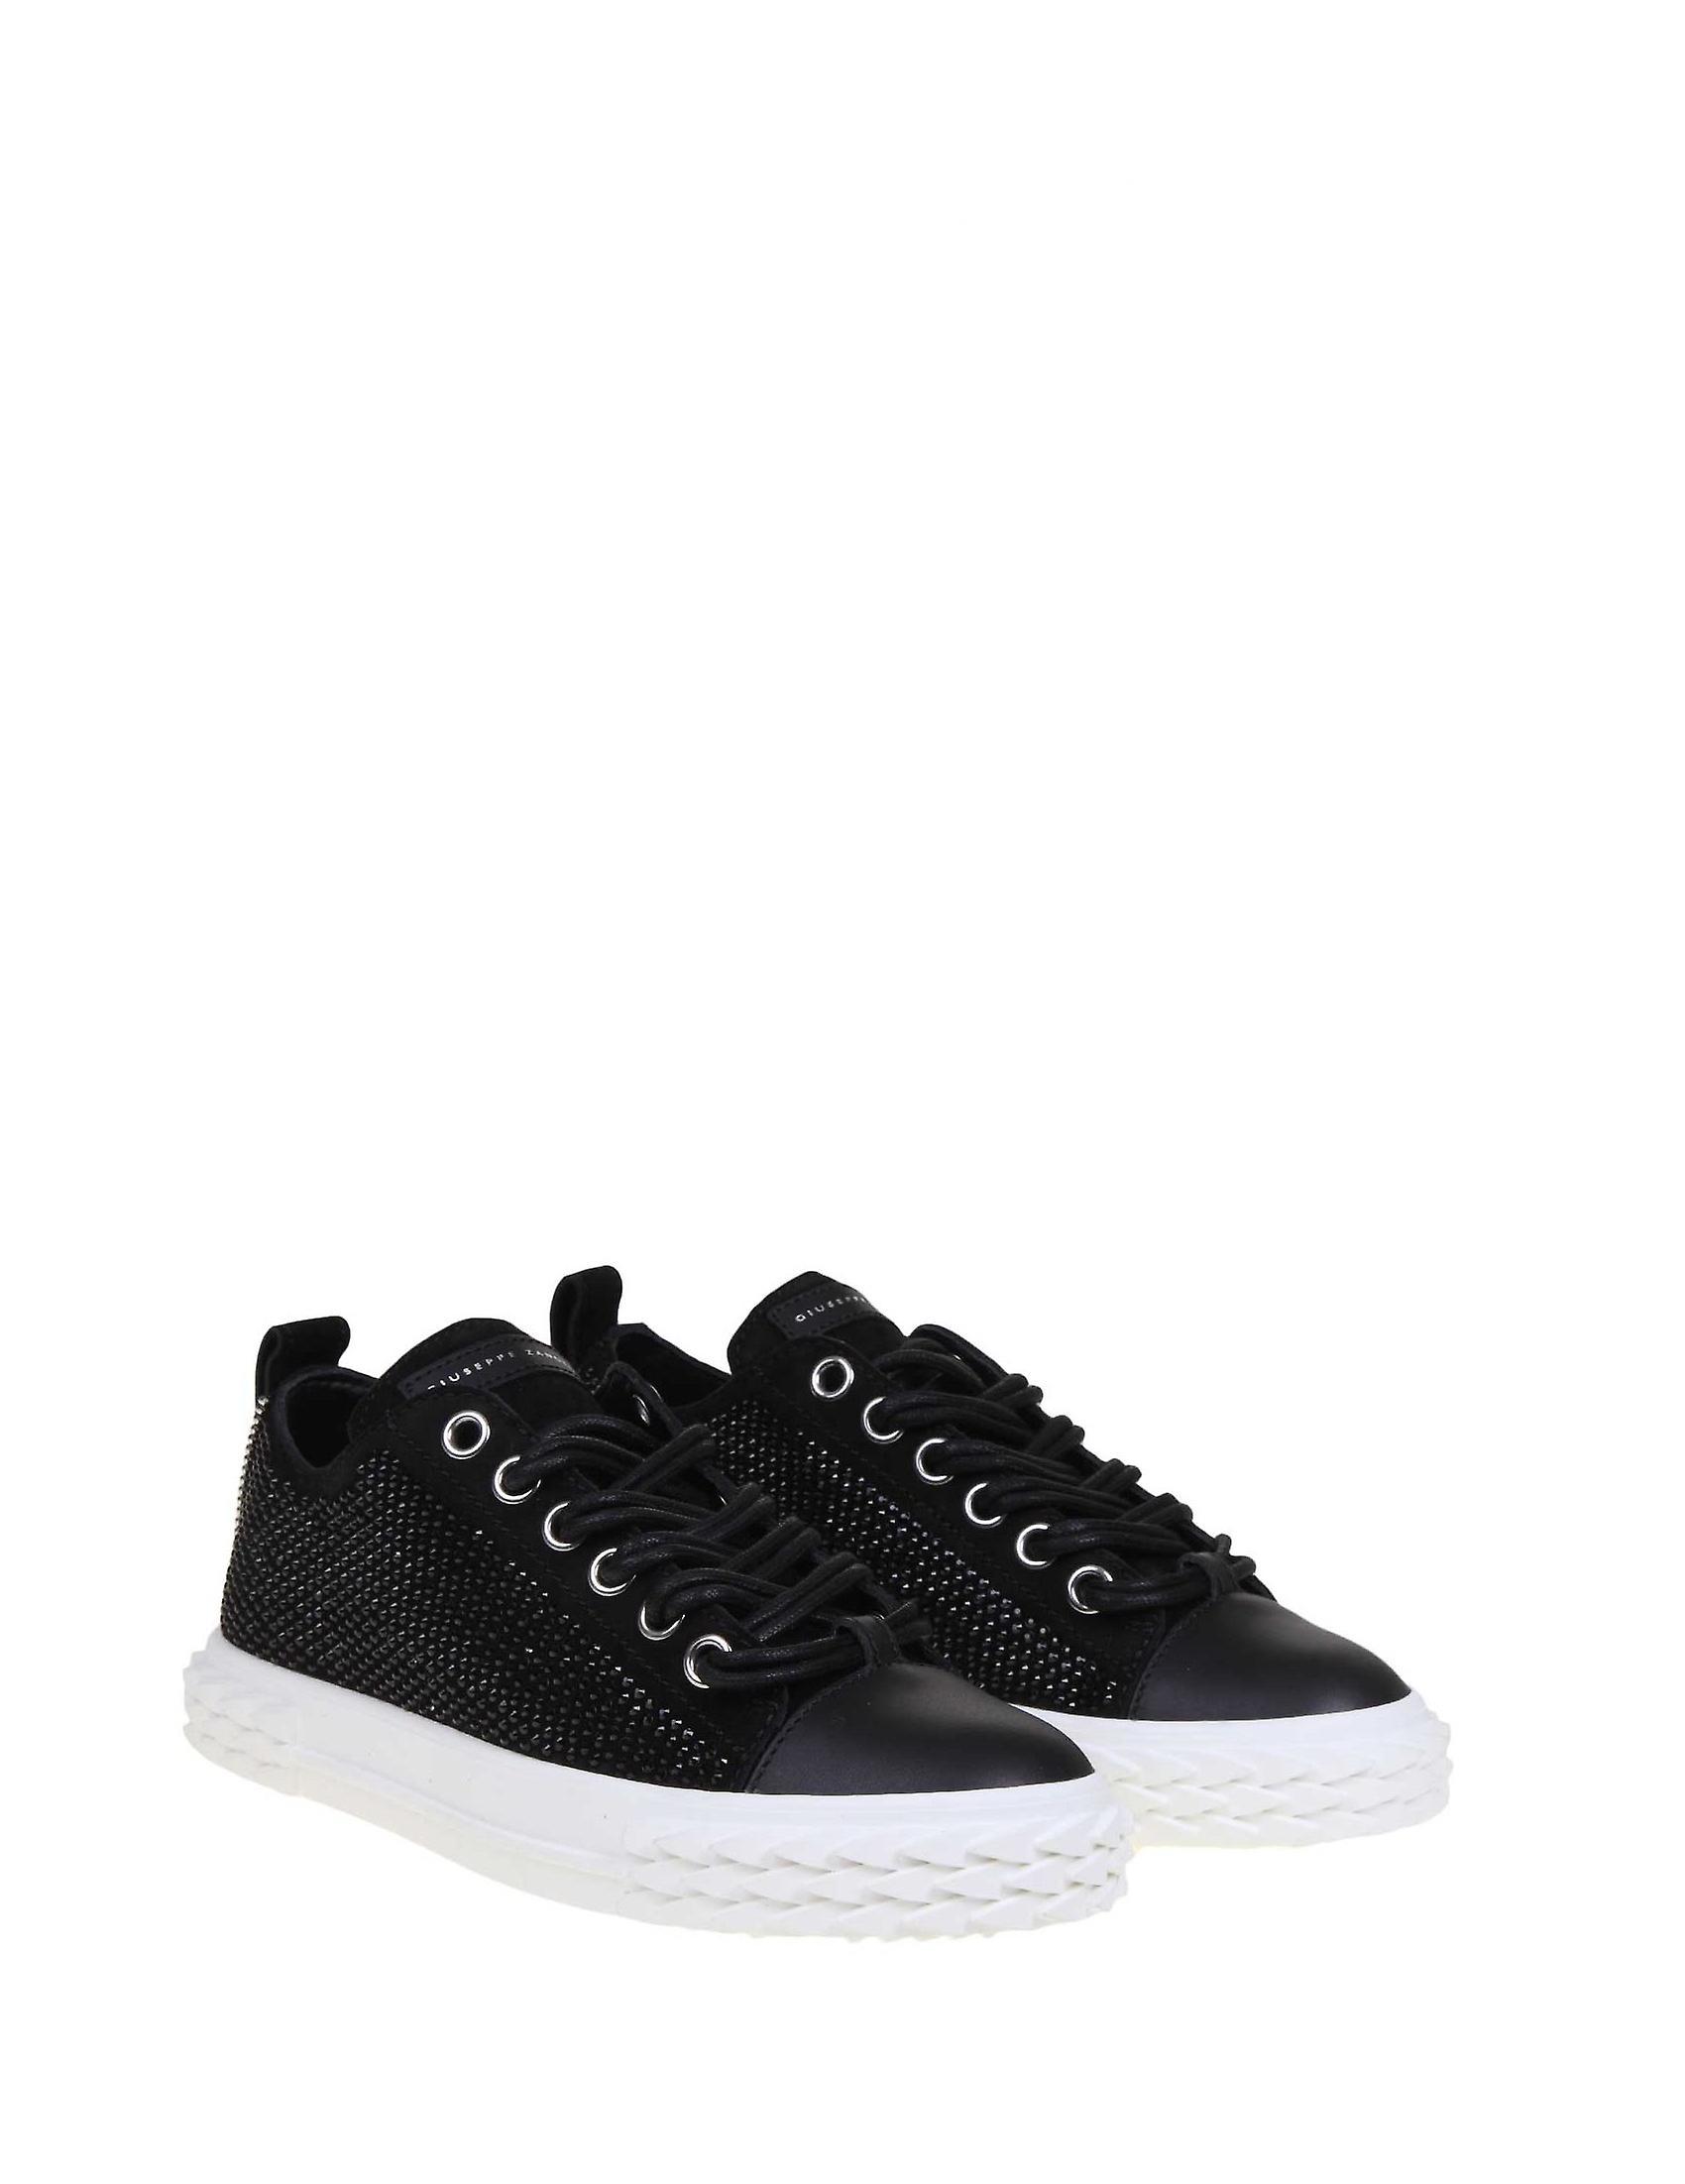 Giuseppe Zanotti Design Rs00051001 Women's Black Leather Sneakers